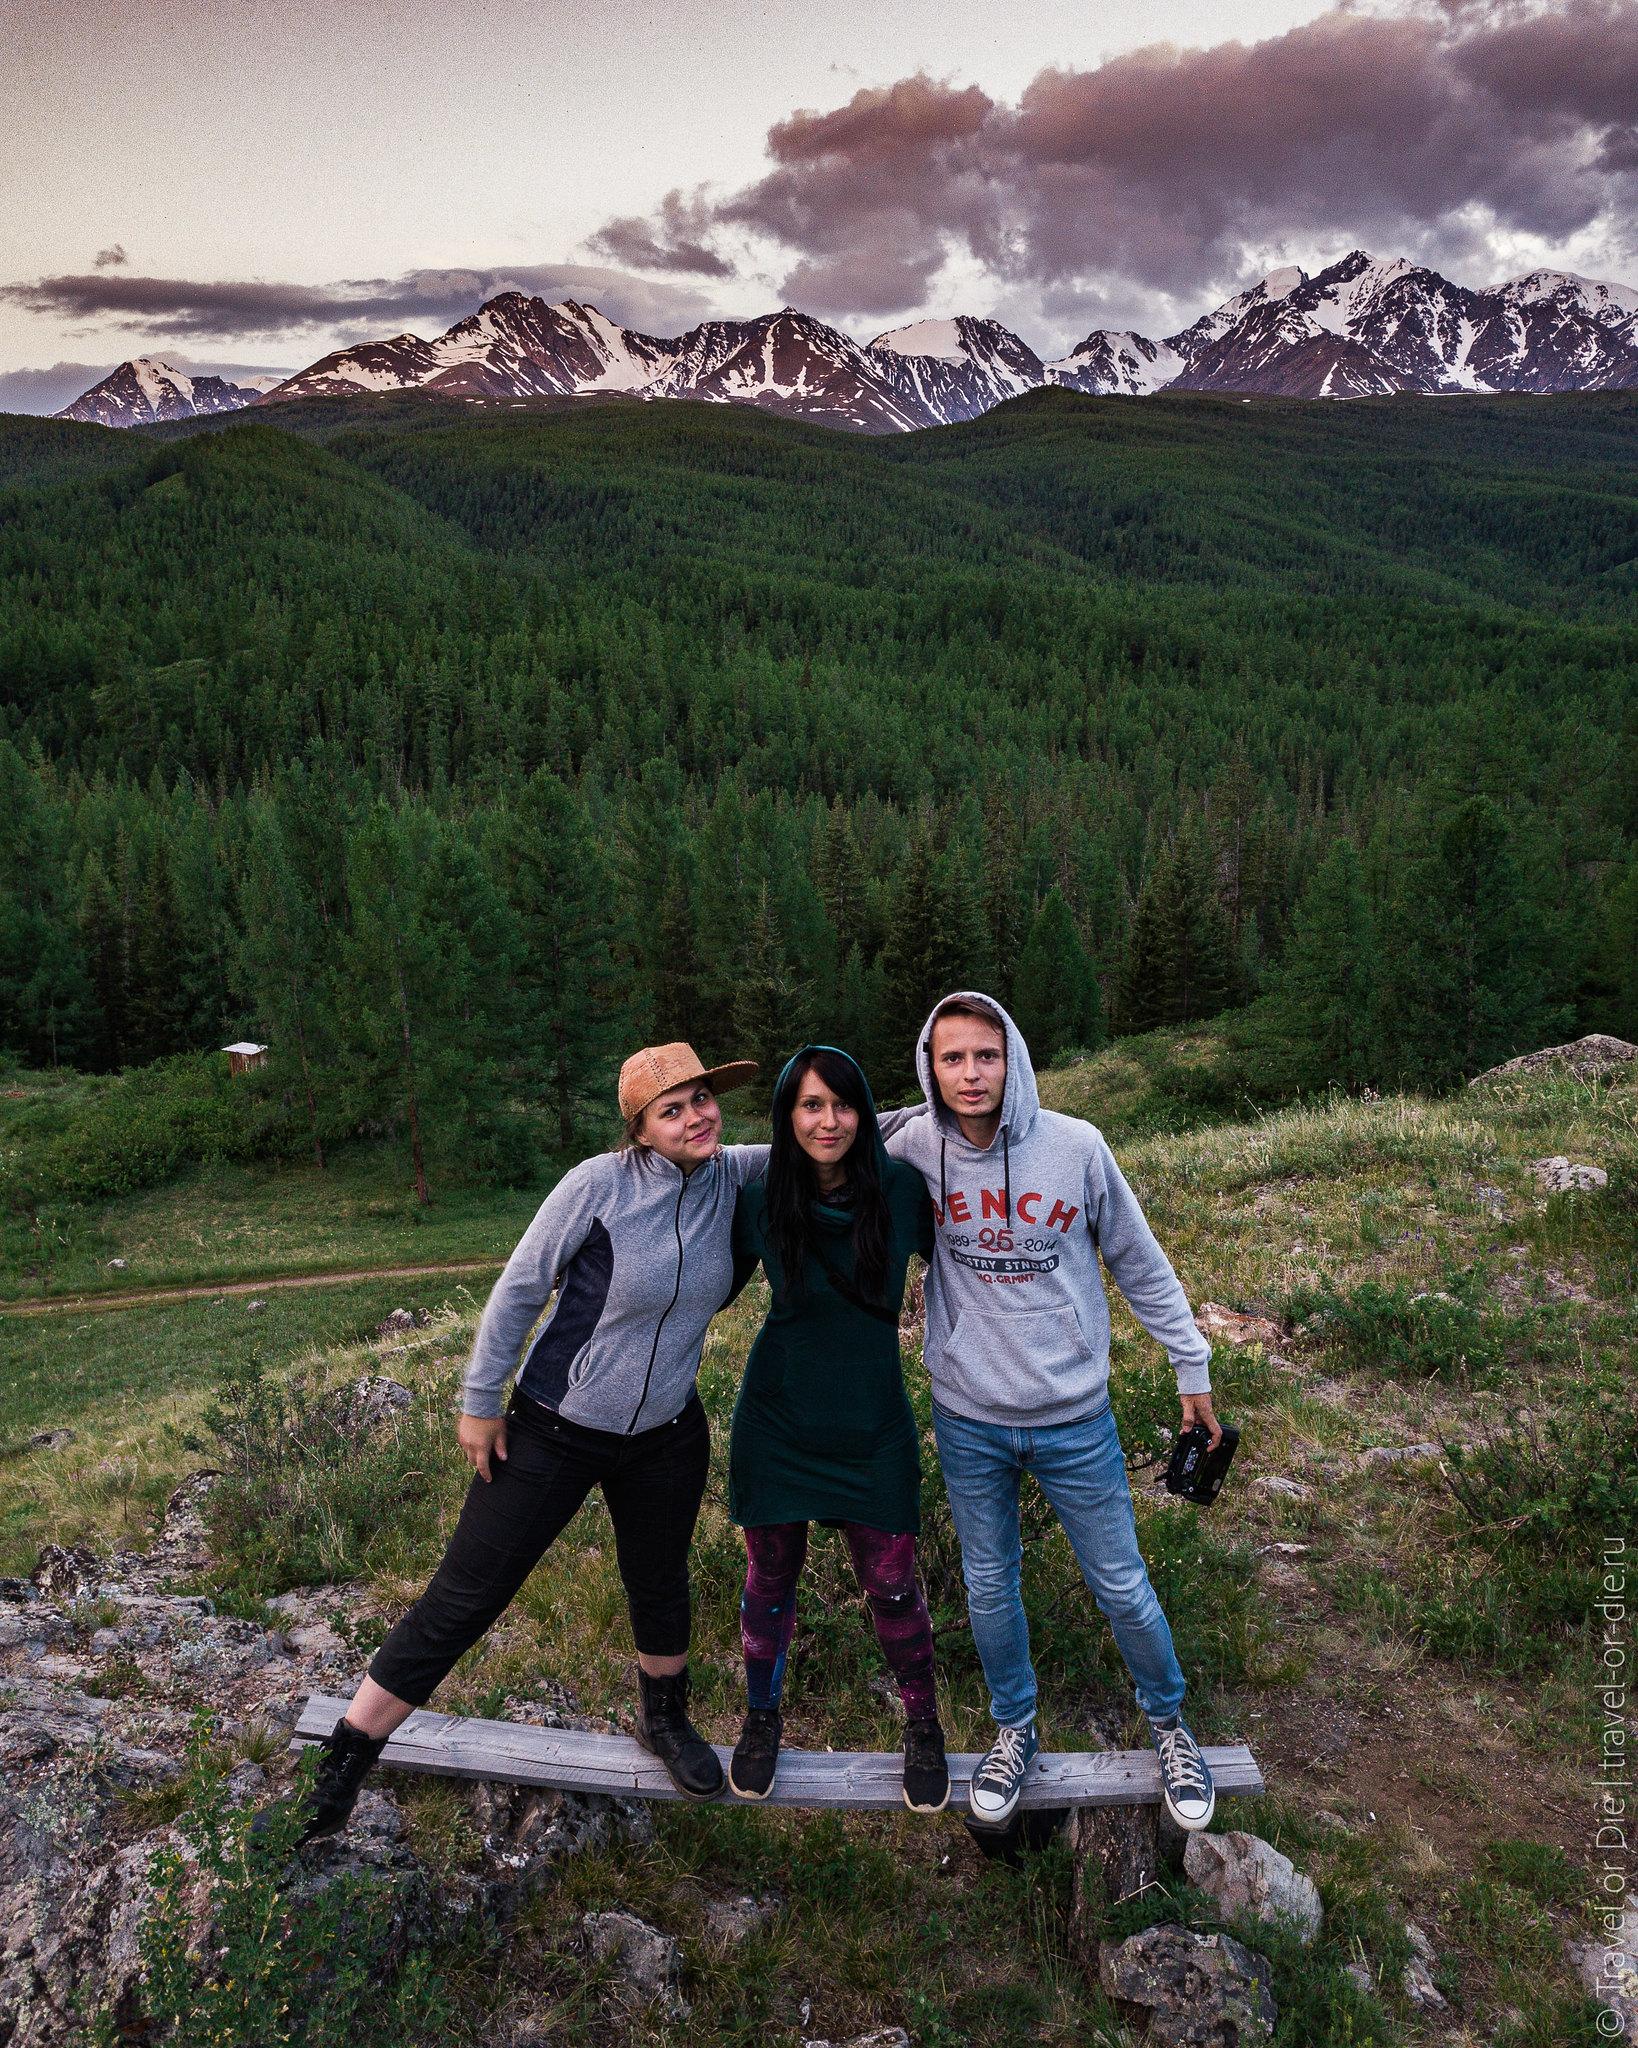 Aktru-Glacier-Altay-Ледник-Актру-Алтай-dji-mavic-0503